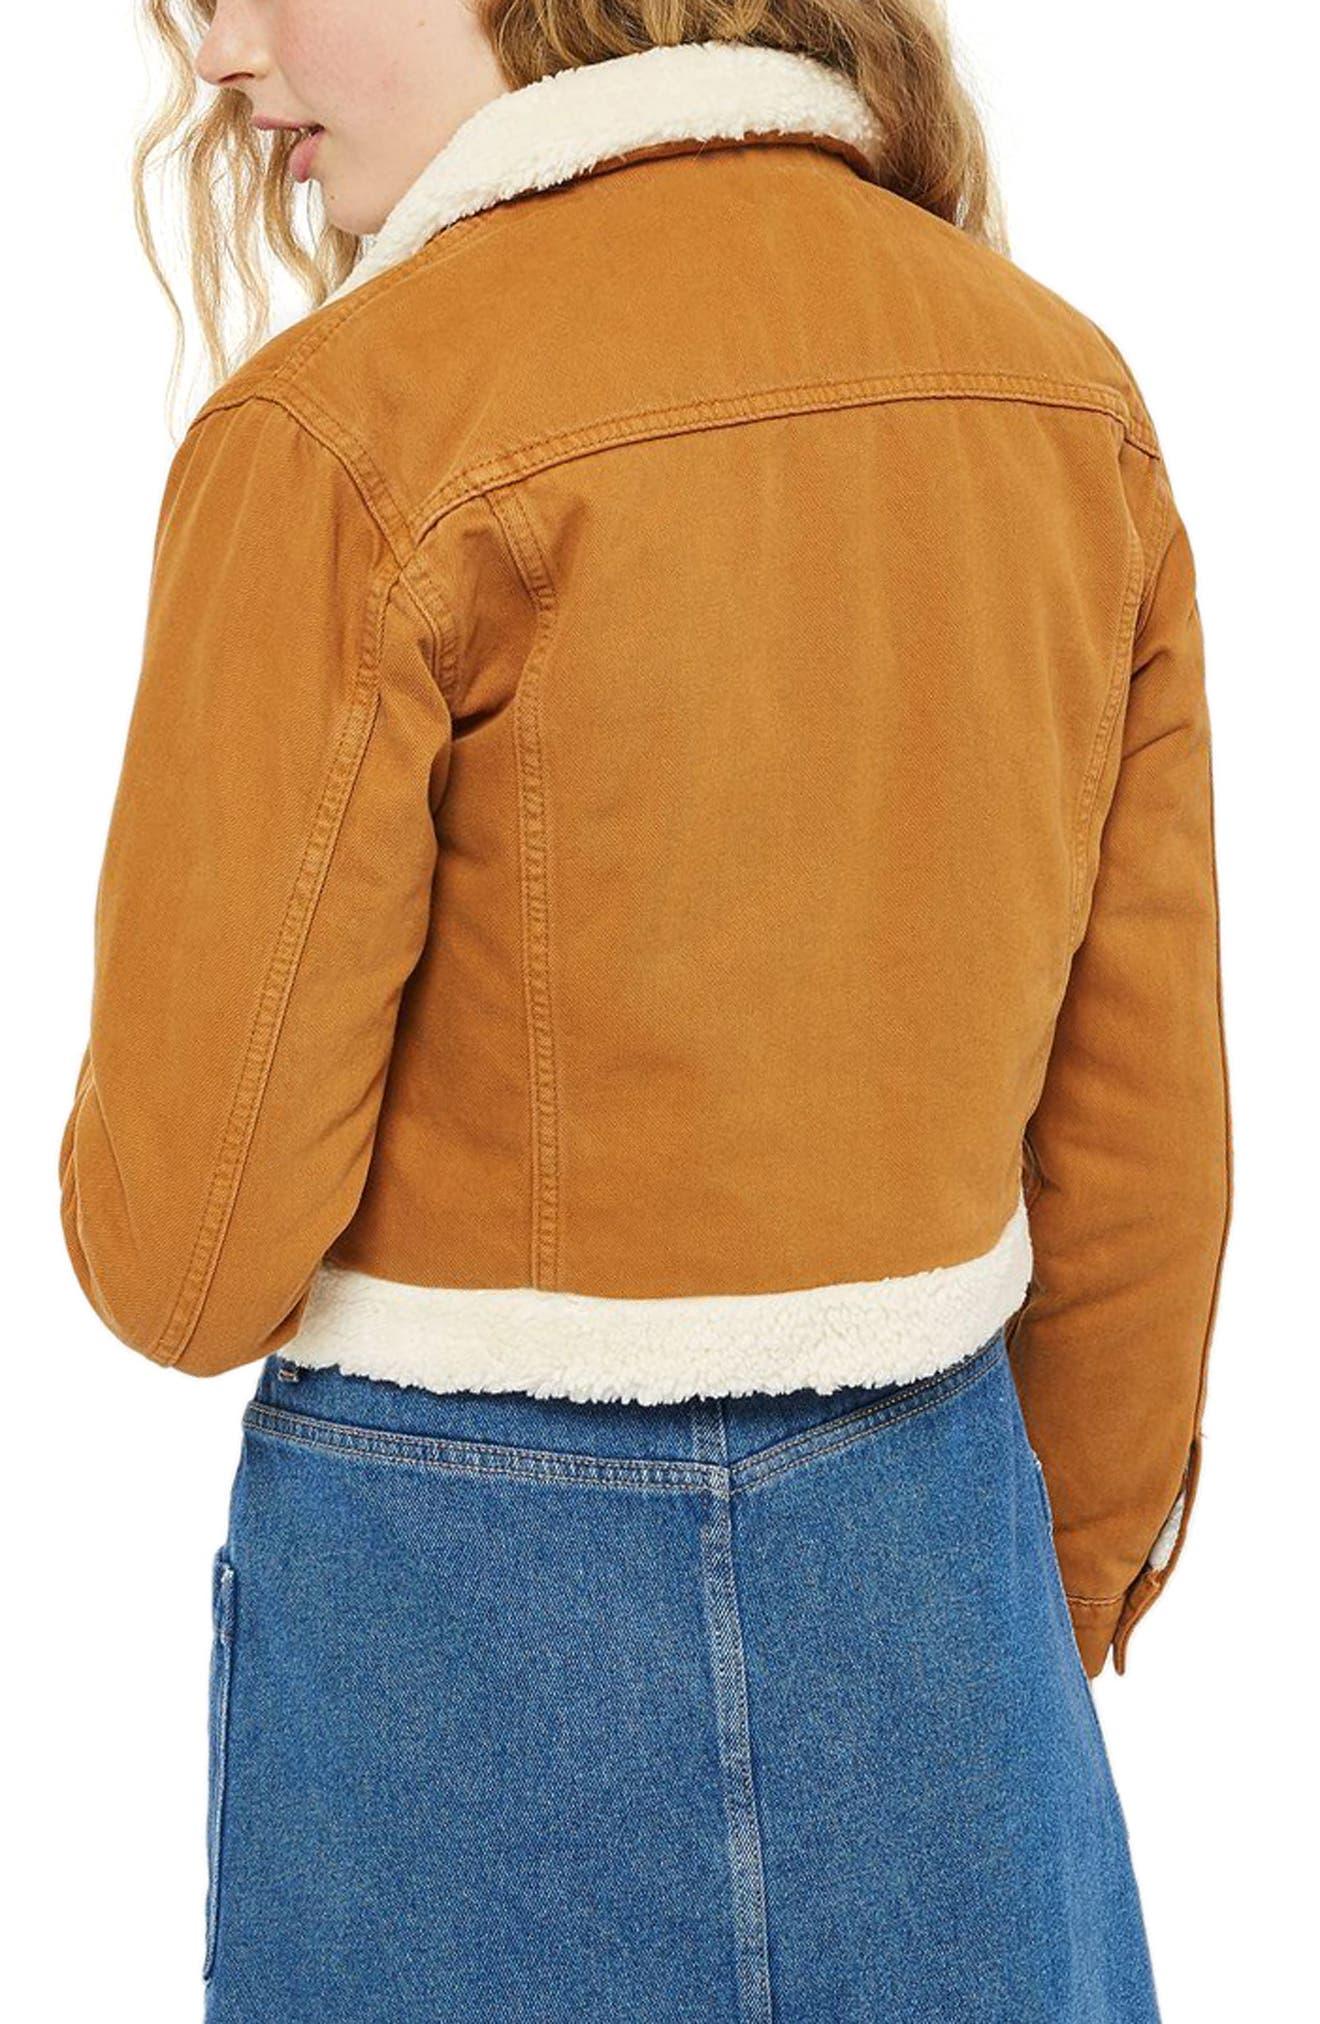 Borg Trim Crop Denim Jacket,                             Alternate thumbnail 2, color,                             210